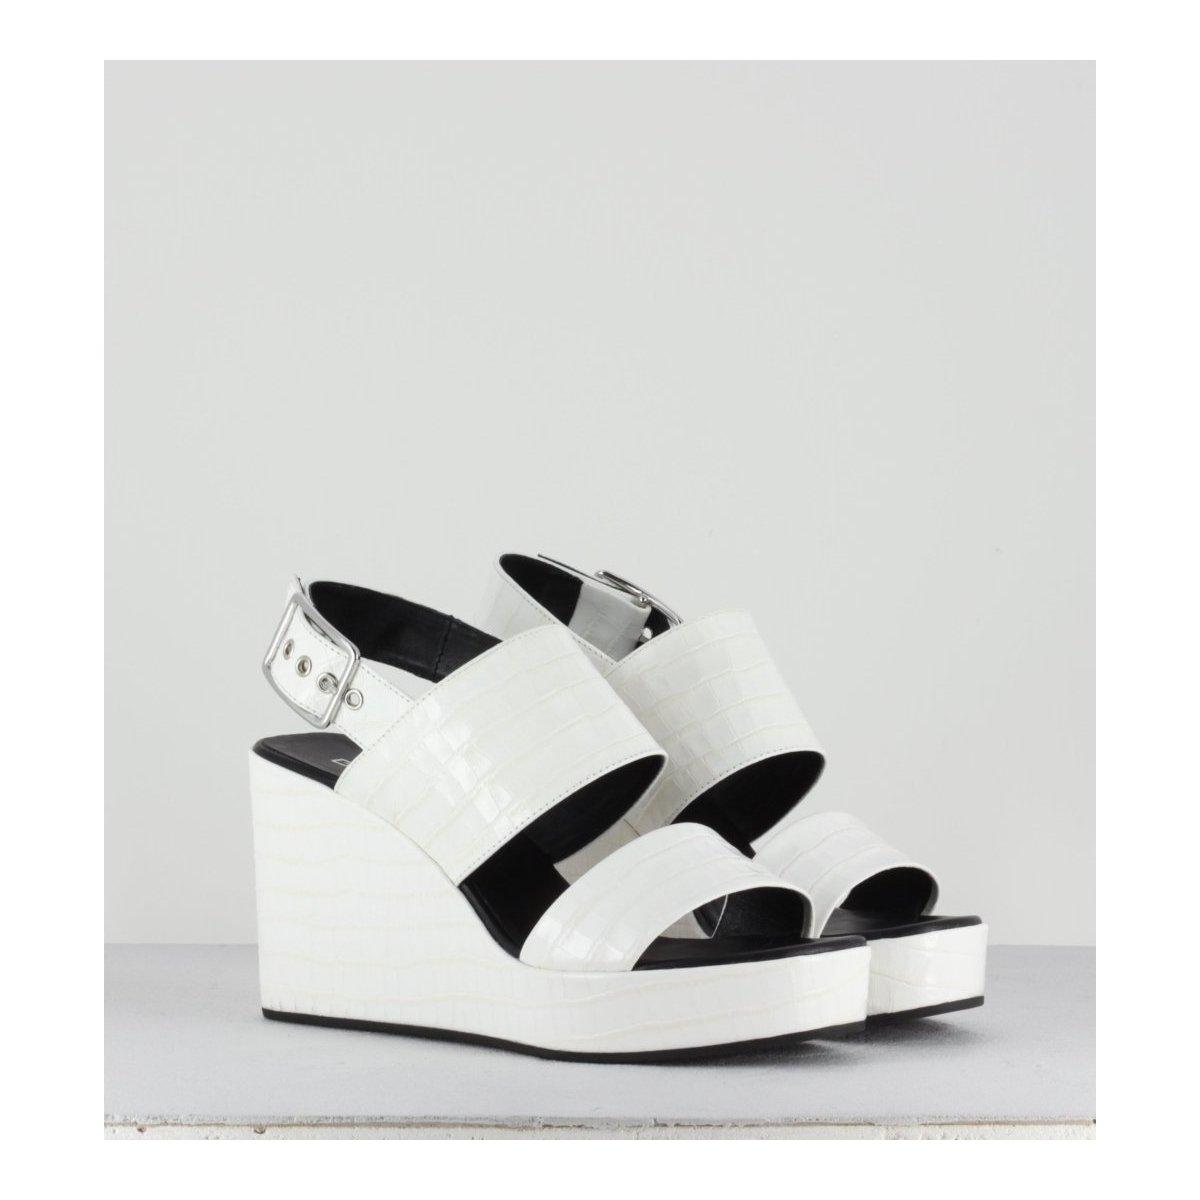 Sandales compensées blanches Garrice Lab -2024 BIANCO